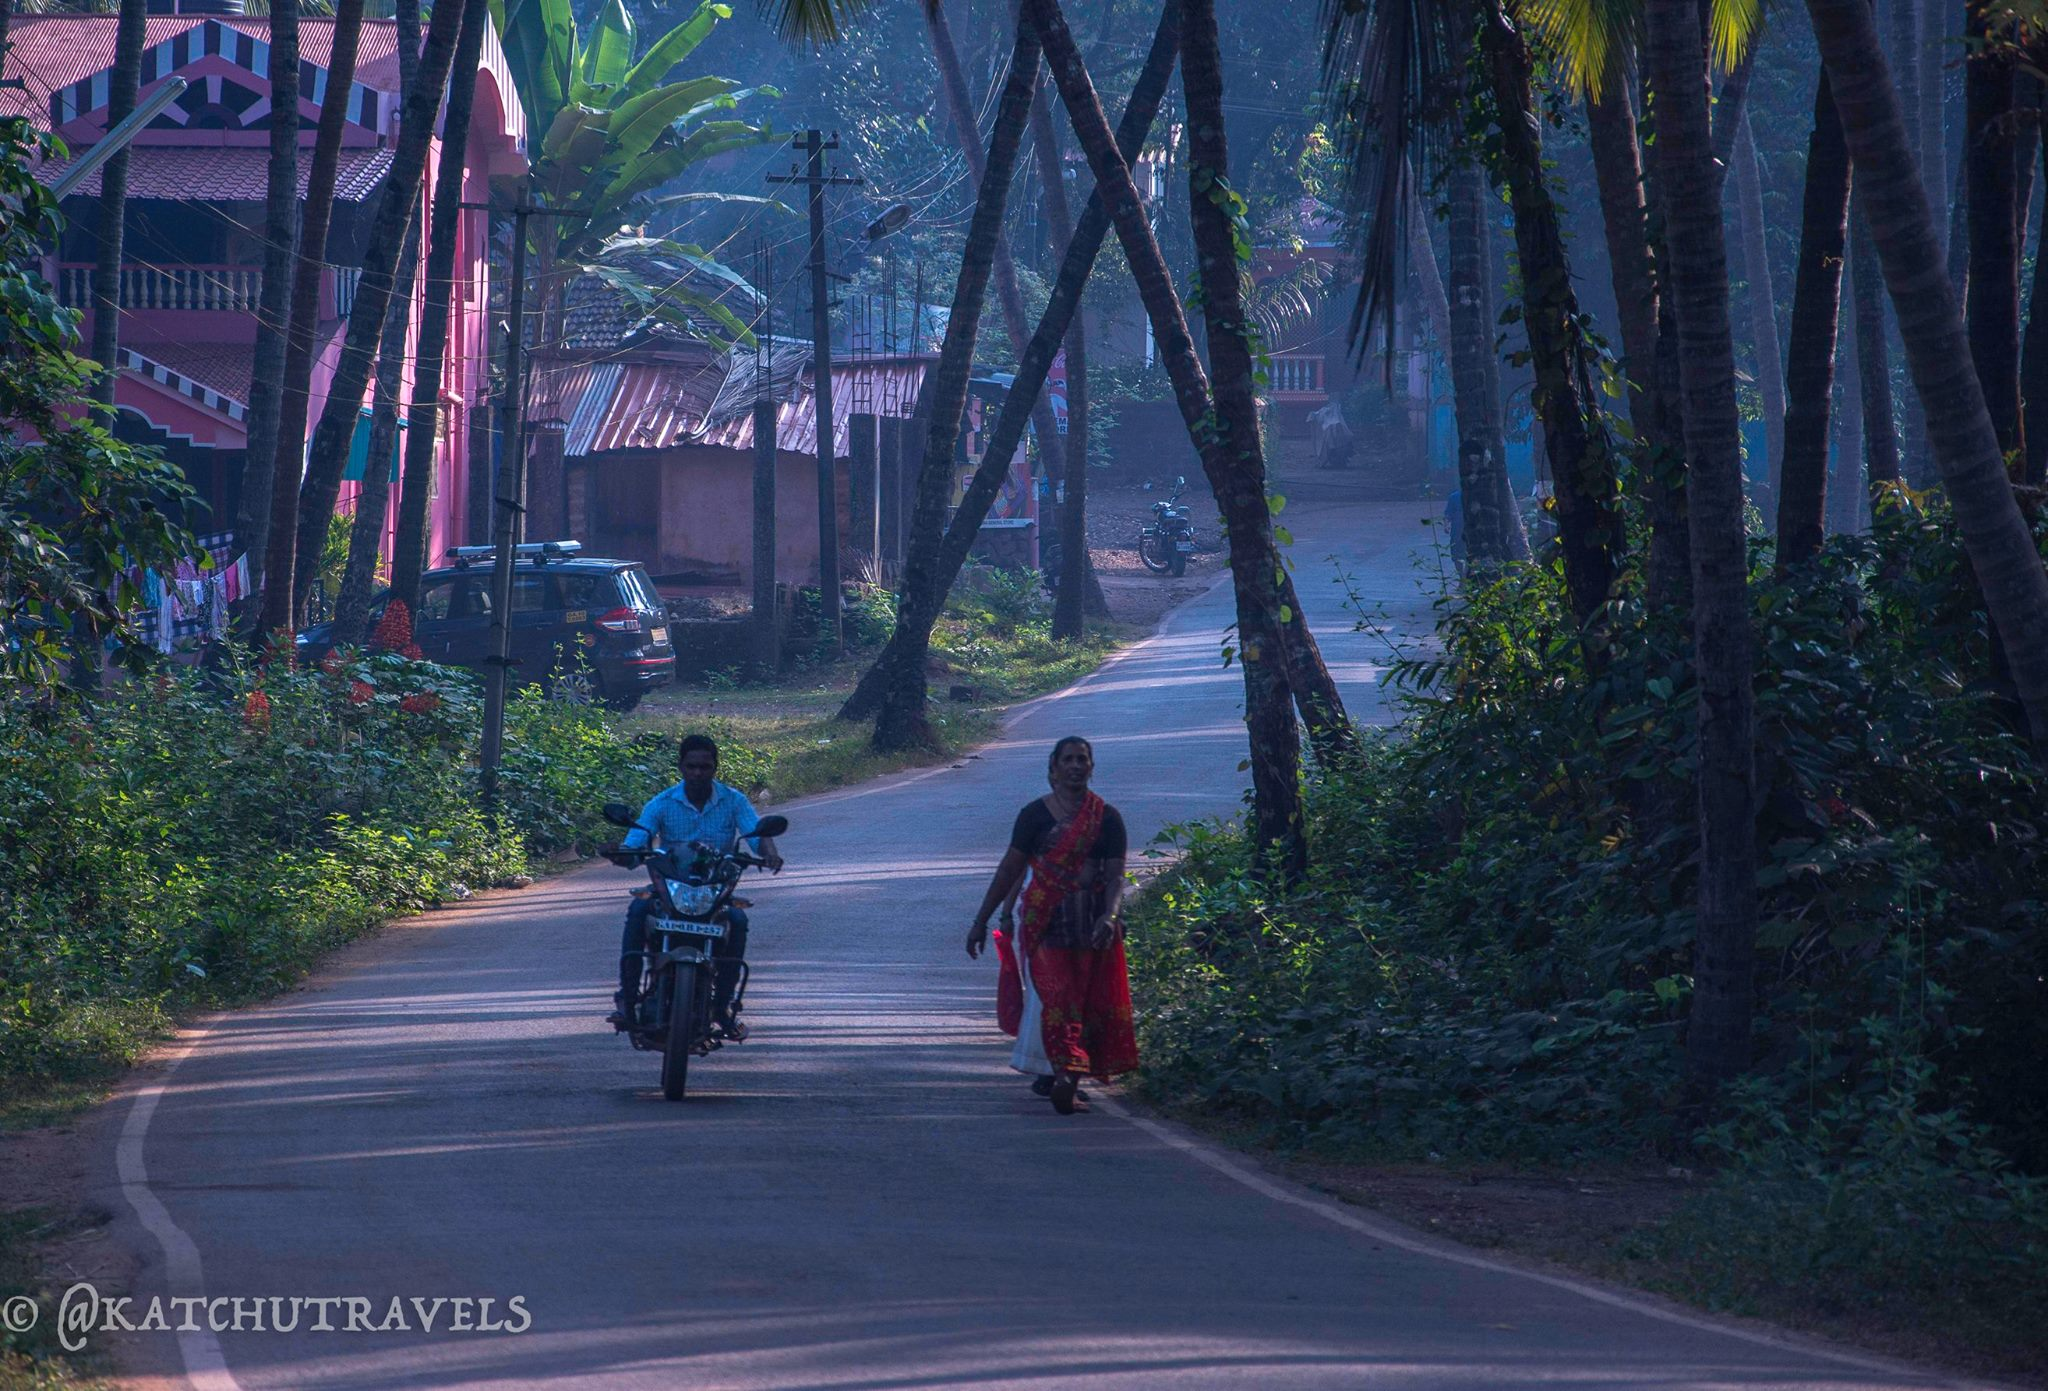 No Jams, No Honking! Shanti in Agonda-Goa